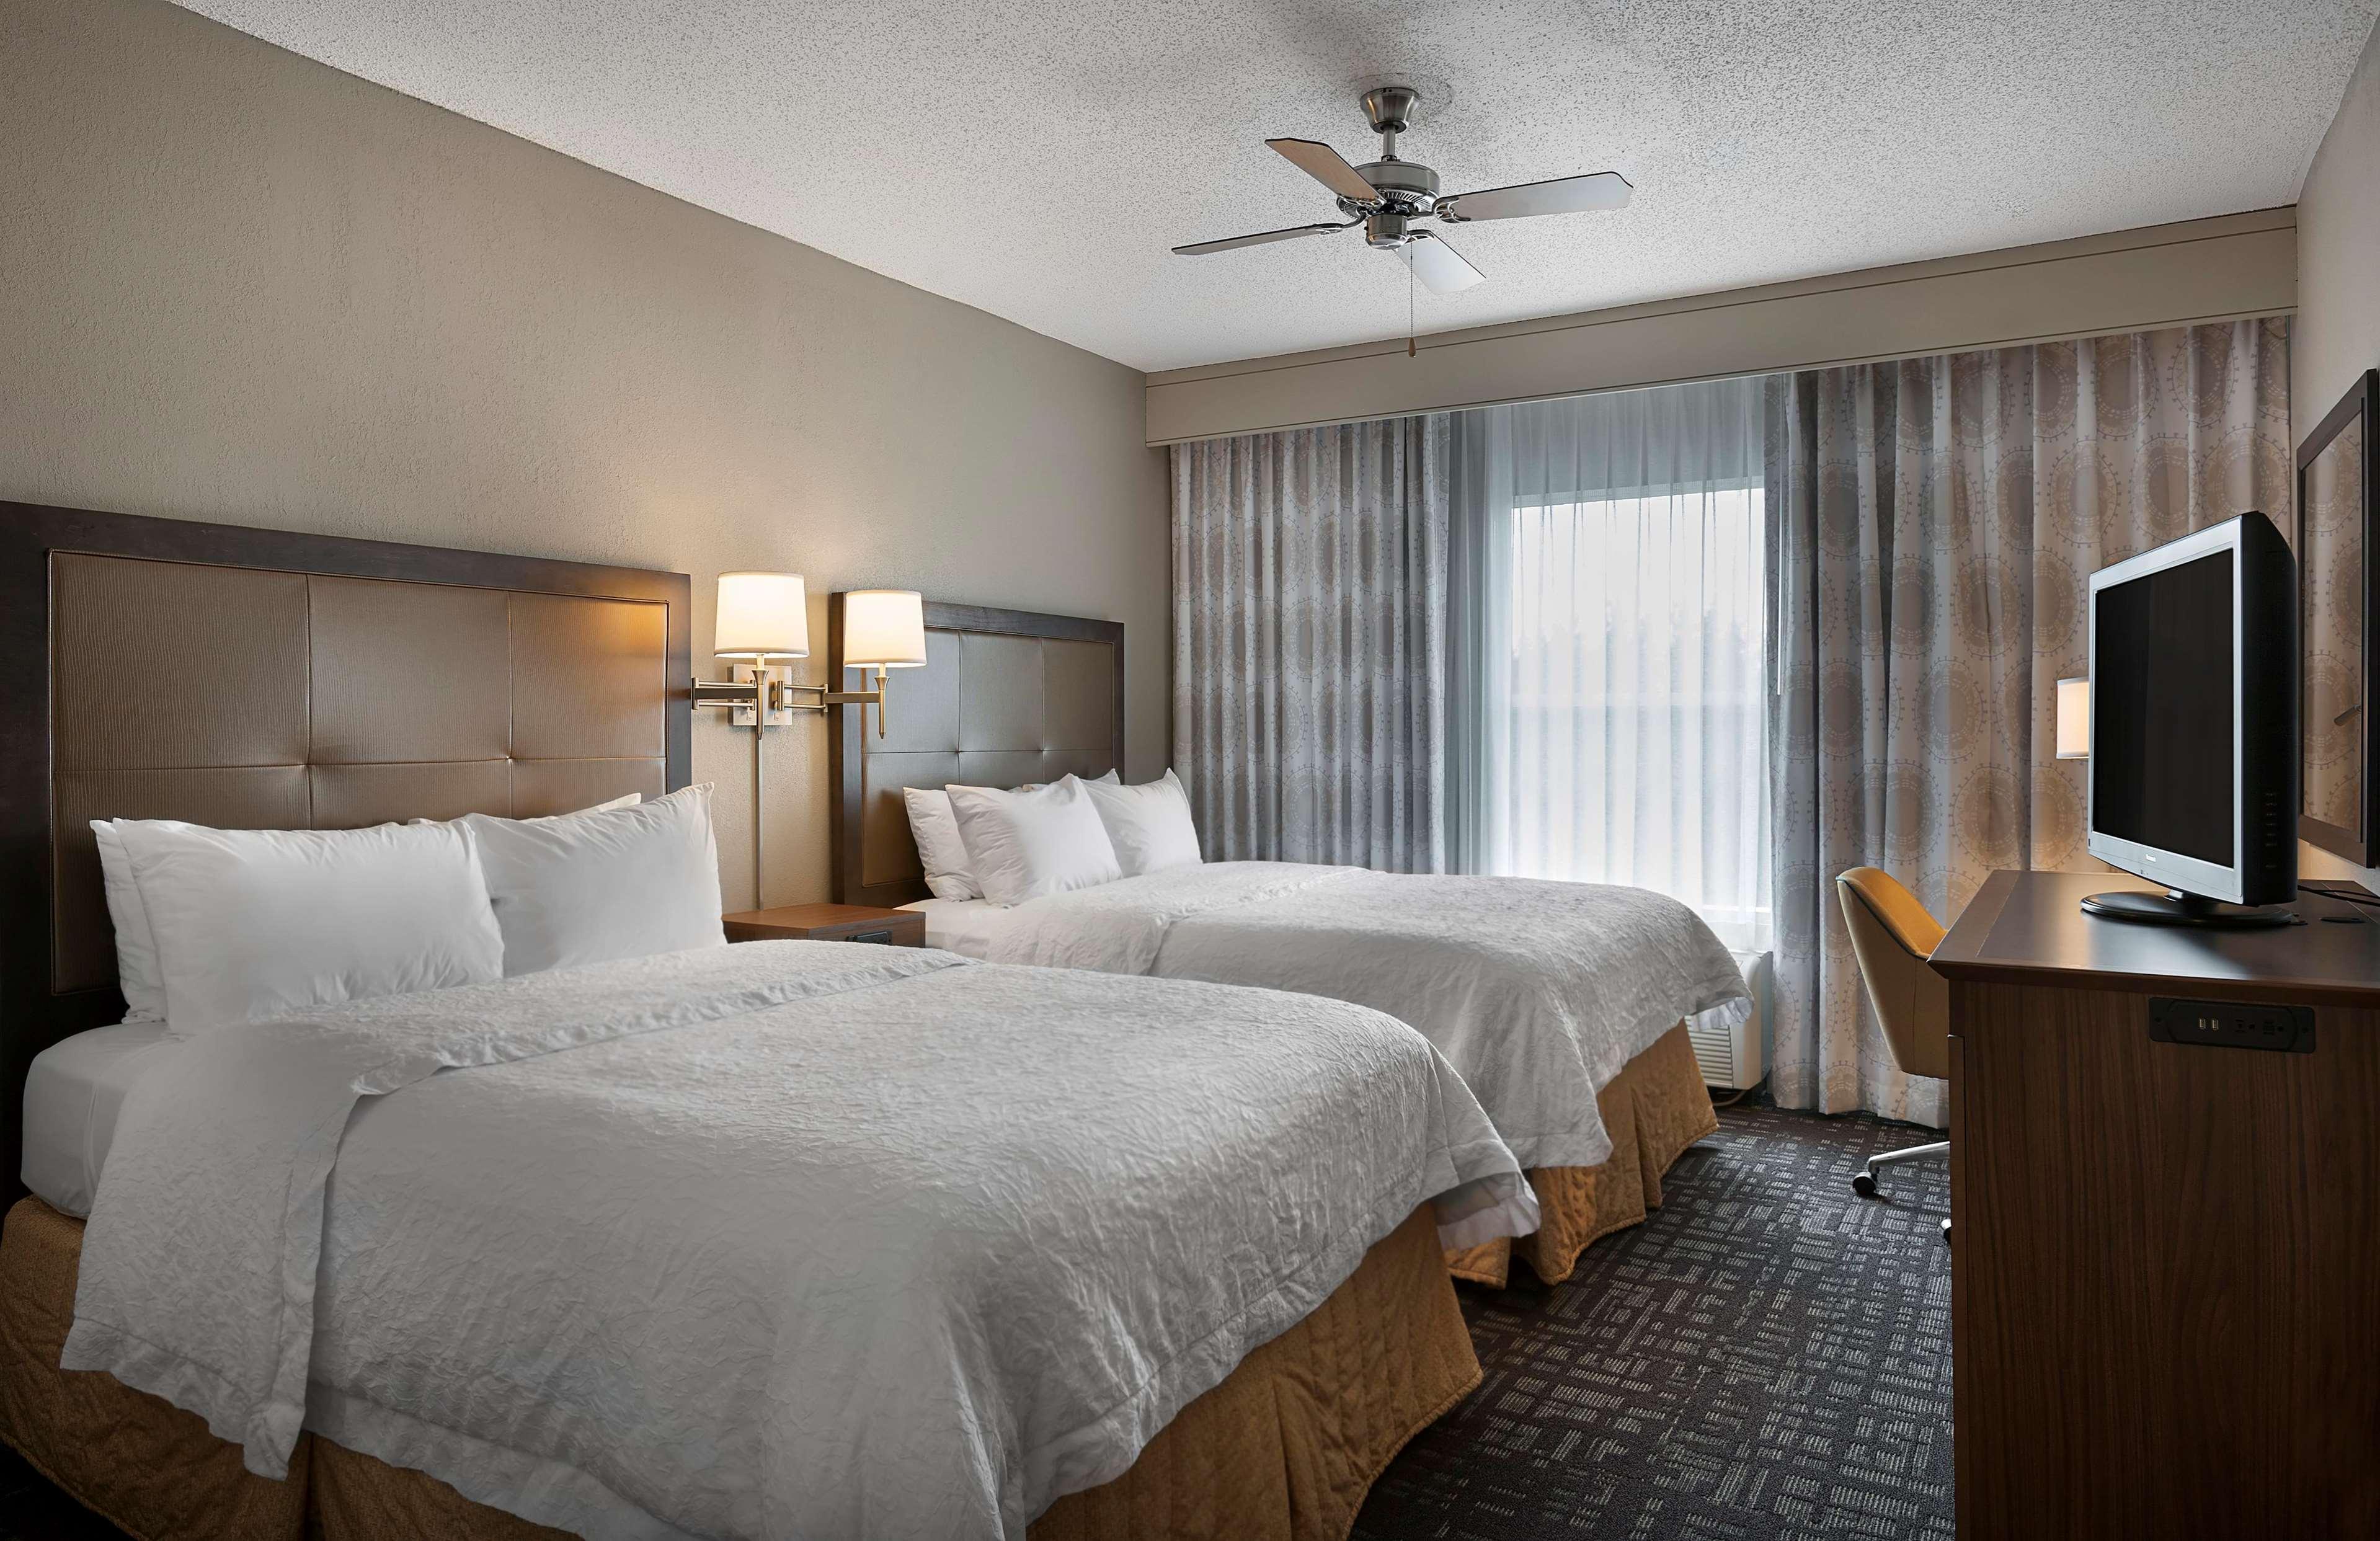 Hampton Inn & Suites Charlotte/Pineville image 11